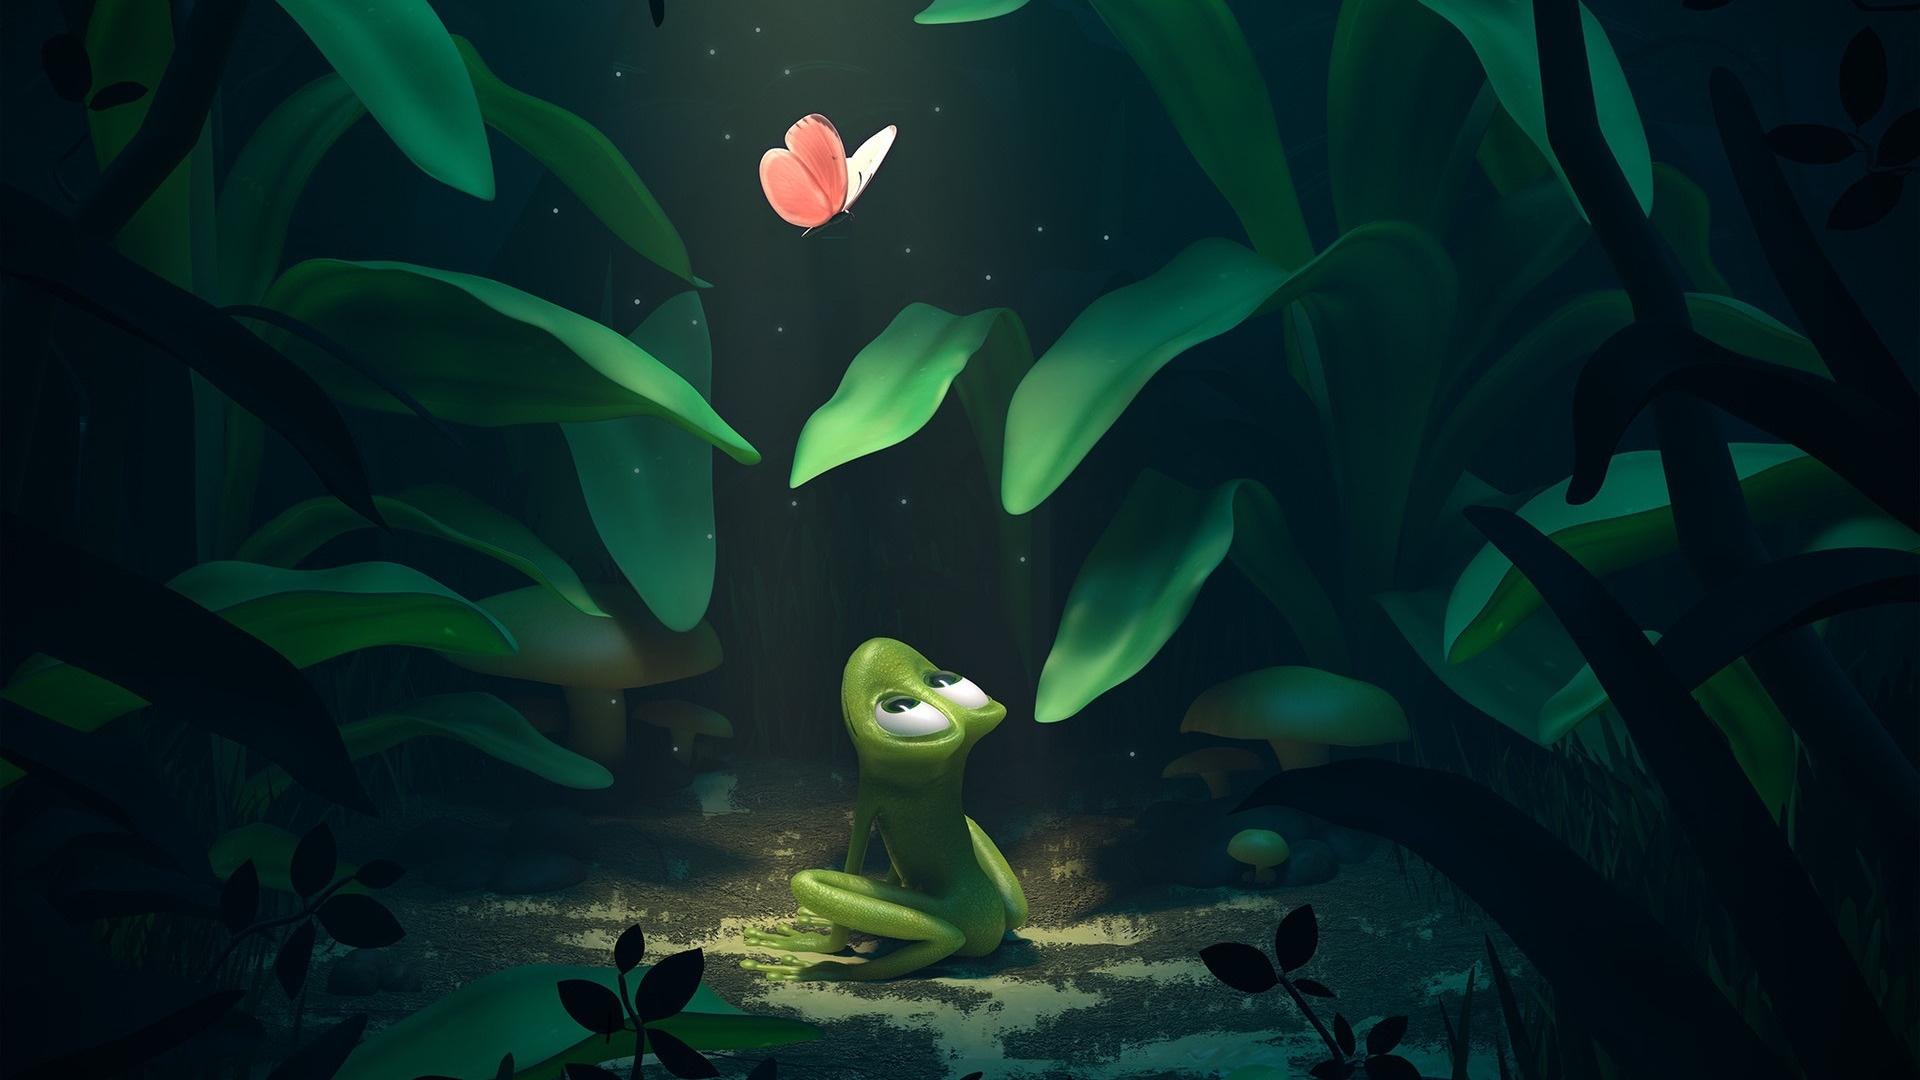 Cartoon Frog free wallpaper